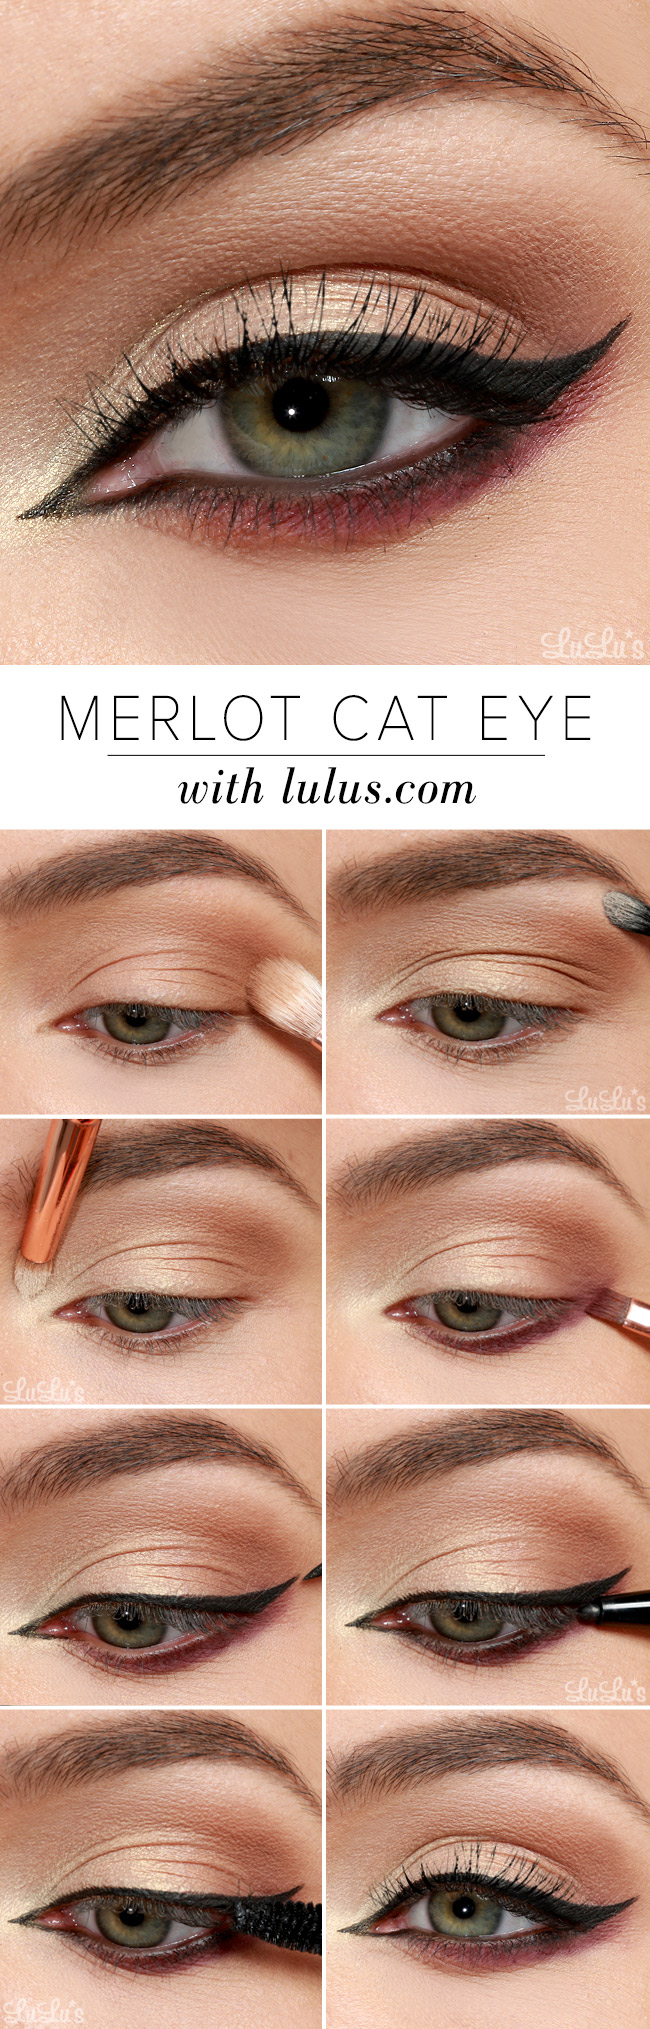 Lulus How-To: Merlot Cat Eye Makeup Tutorial - Lulus.com Fashion Blog